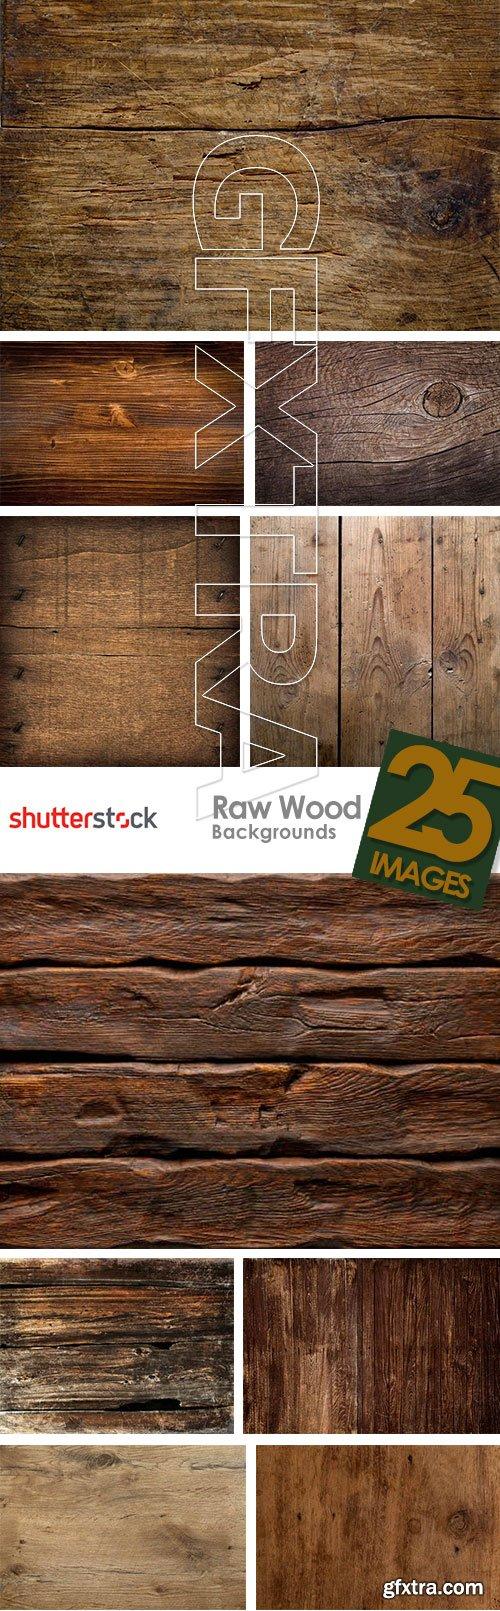 Raw Wood Backgrounds 25xJPG